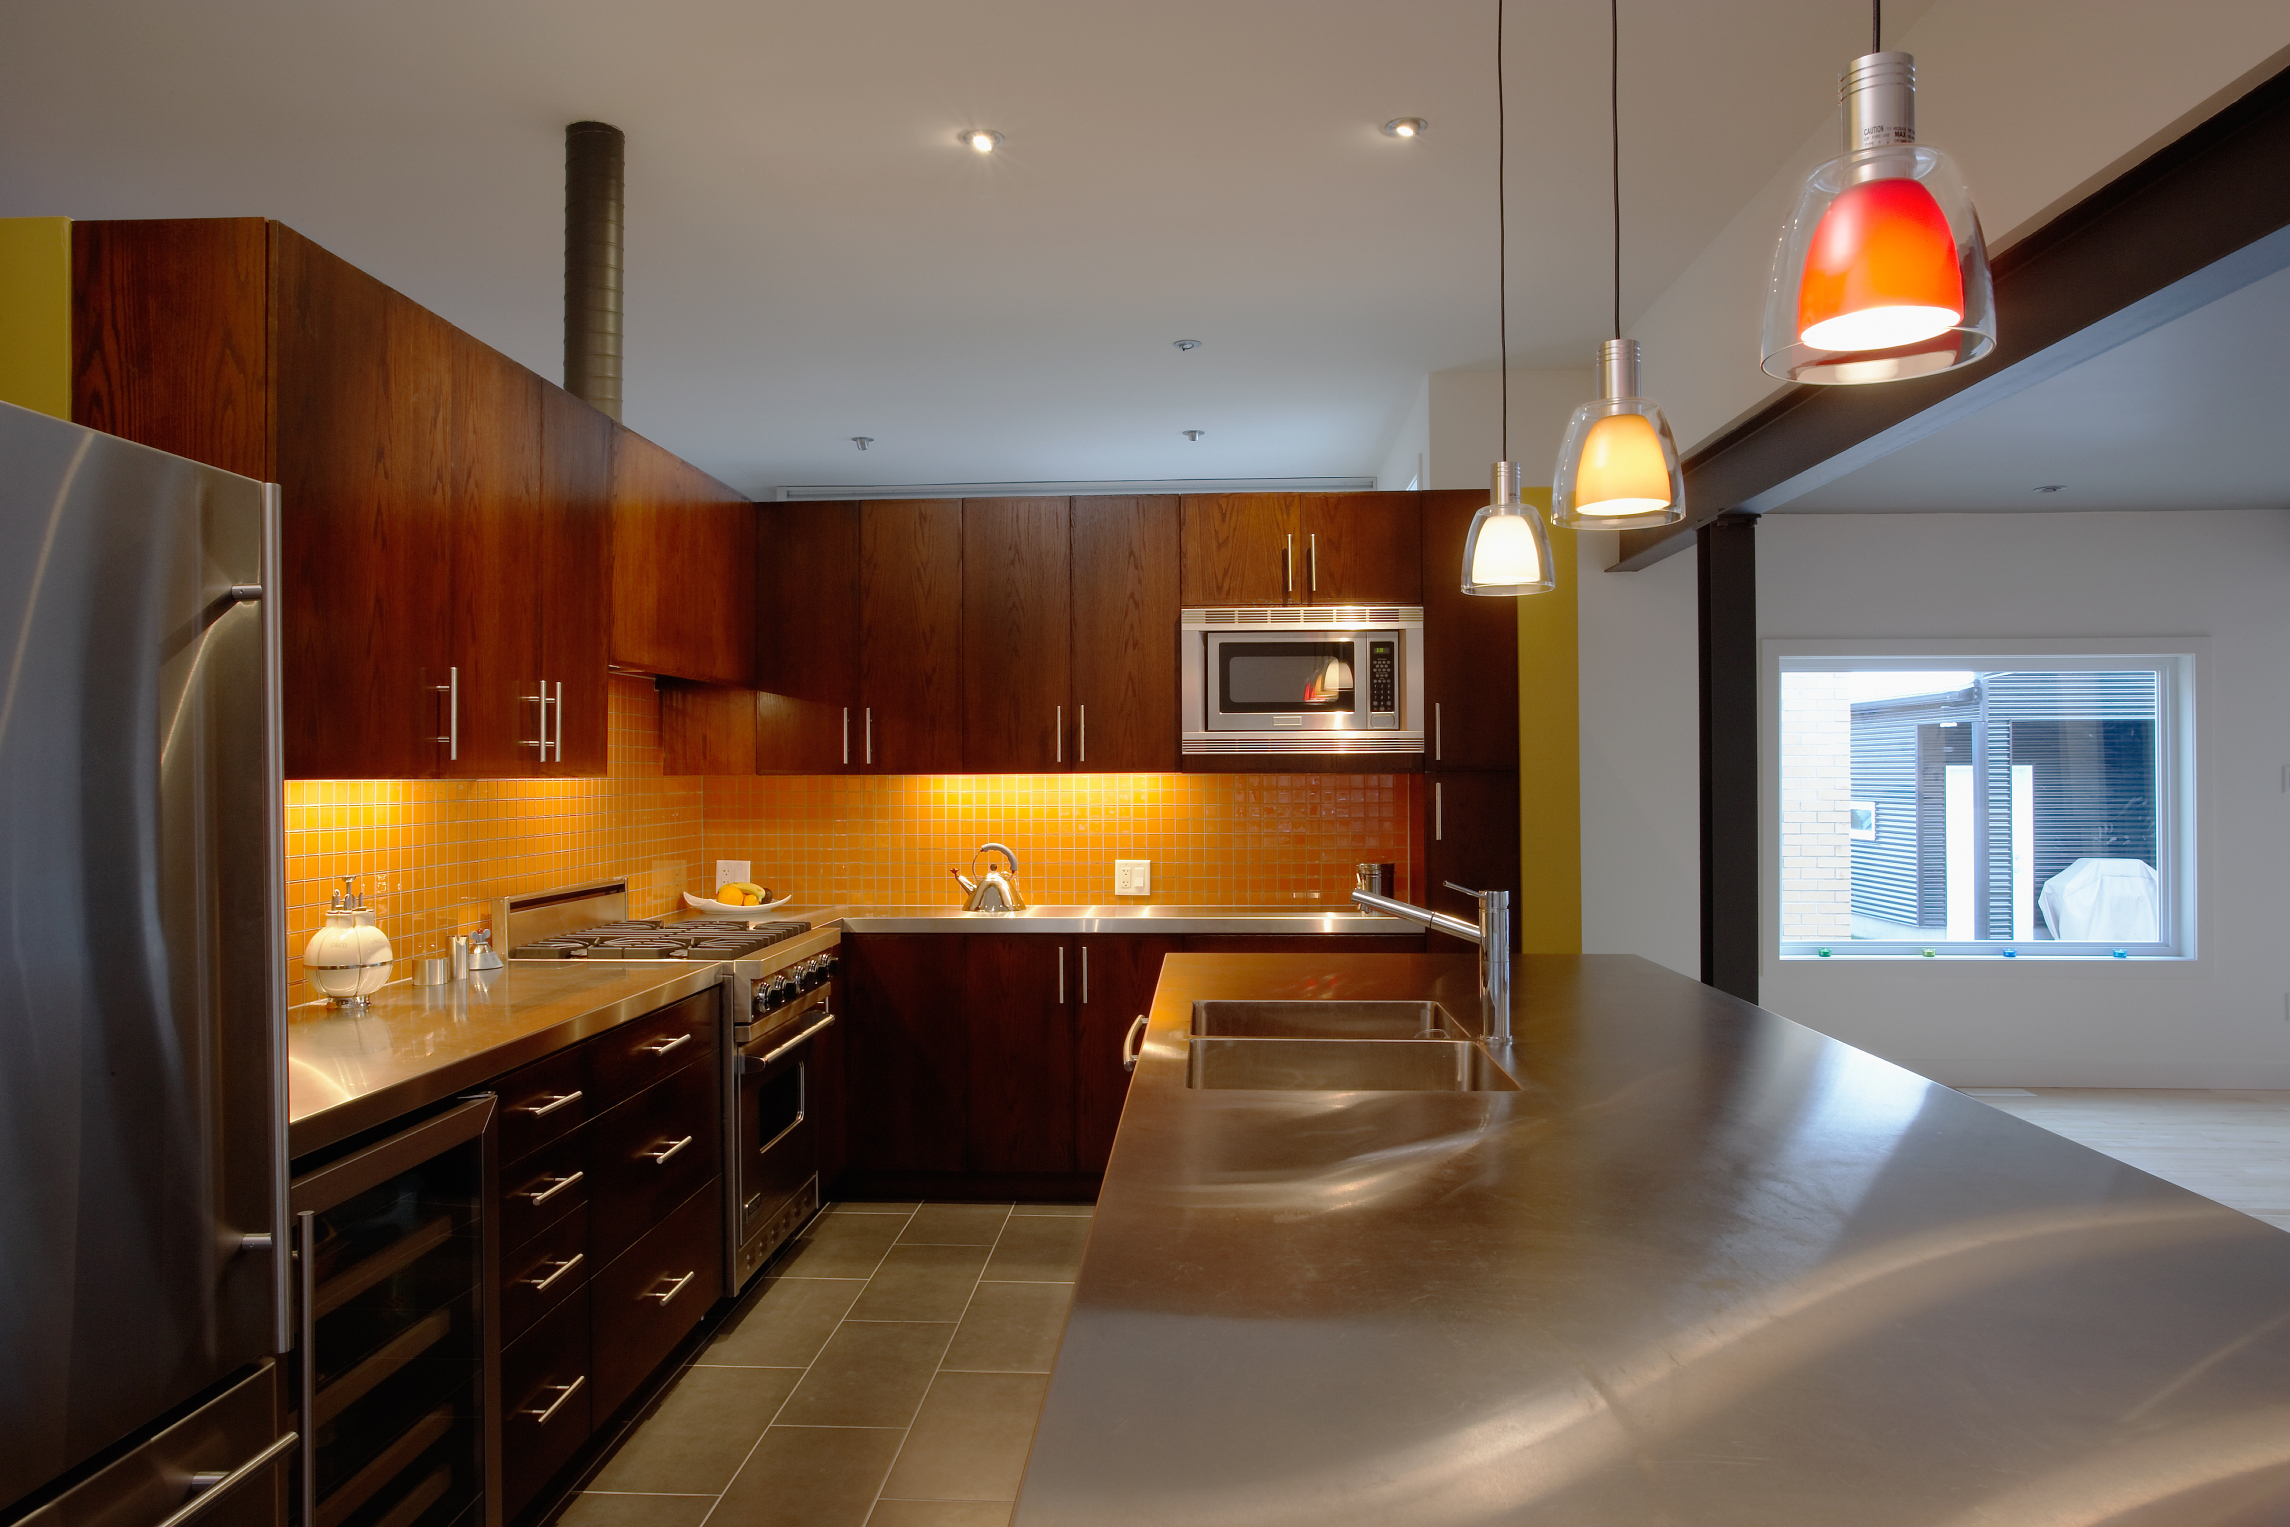 Luces Led Para Cocina. . Solled Universal Luces Led Para Cocina ...